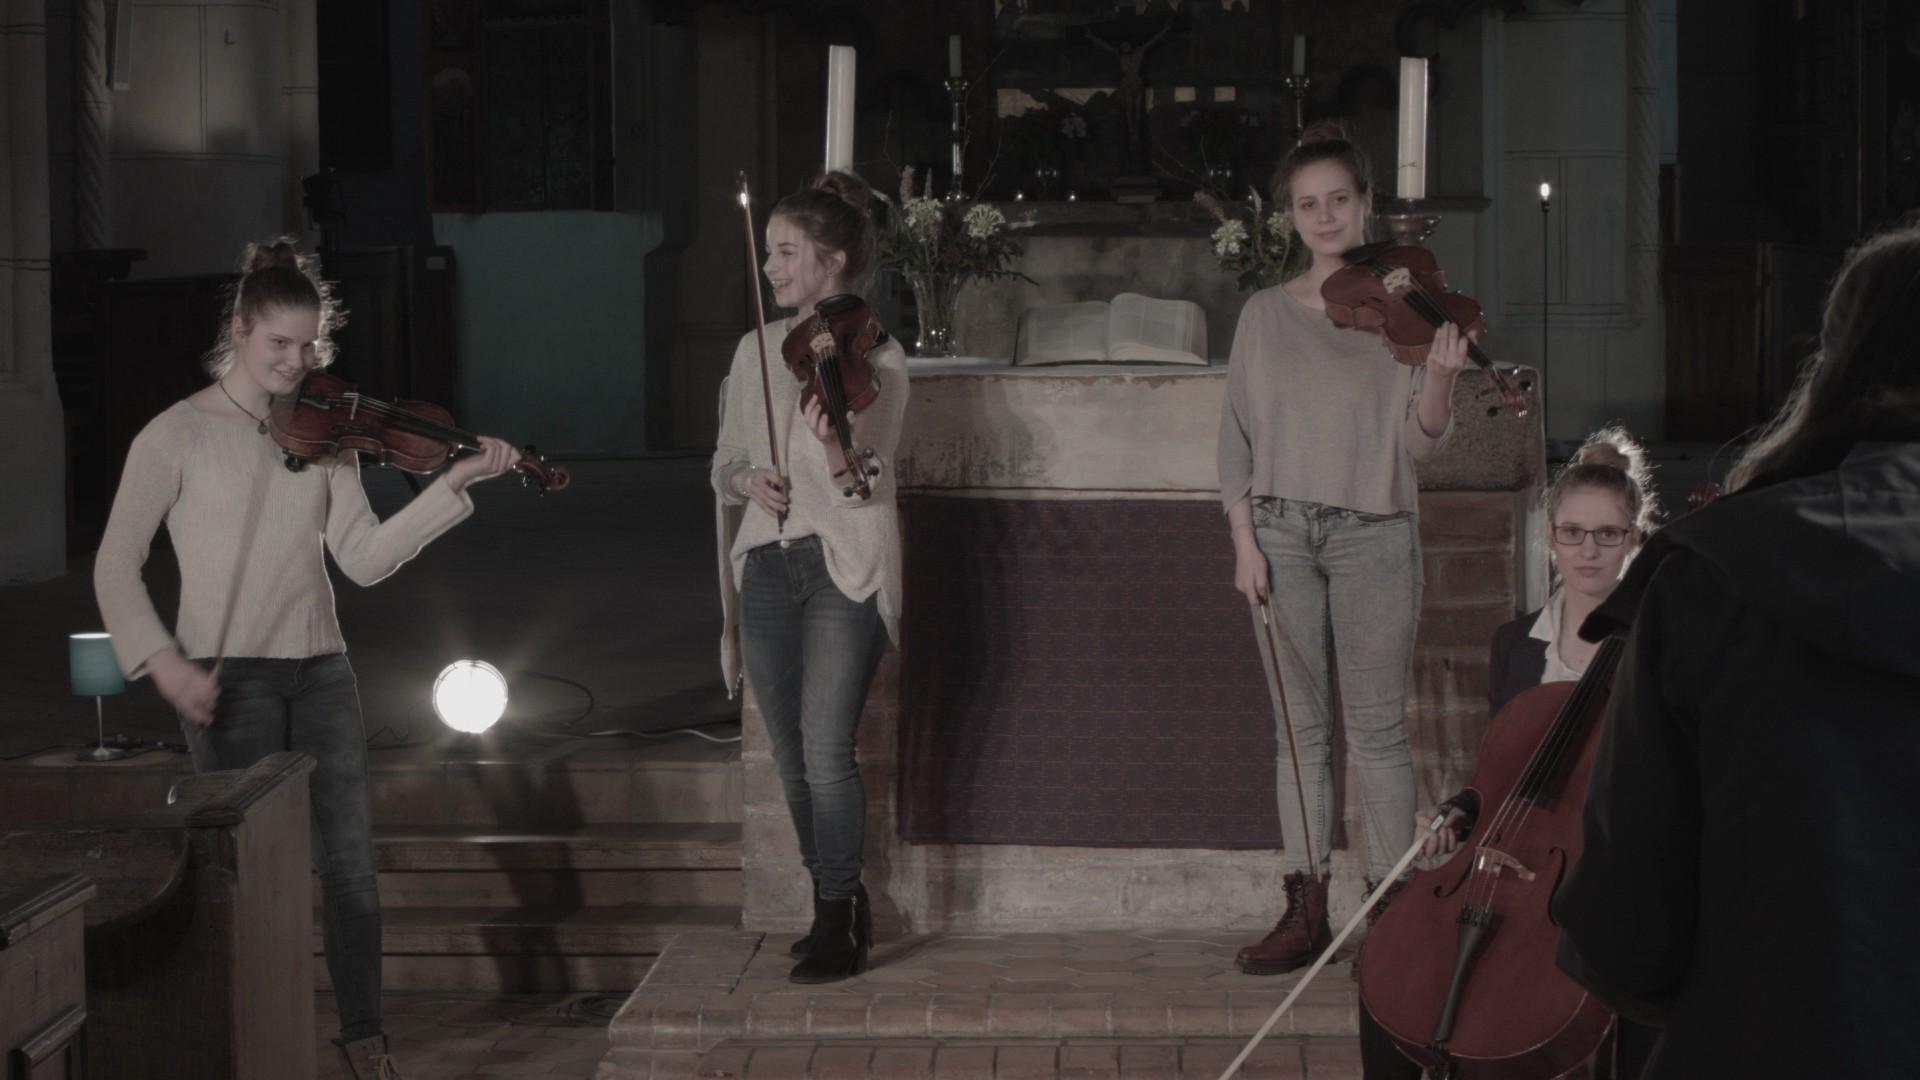 MusikvideoKircheBTS-66